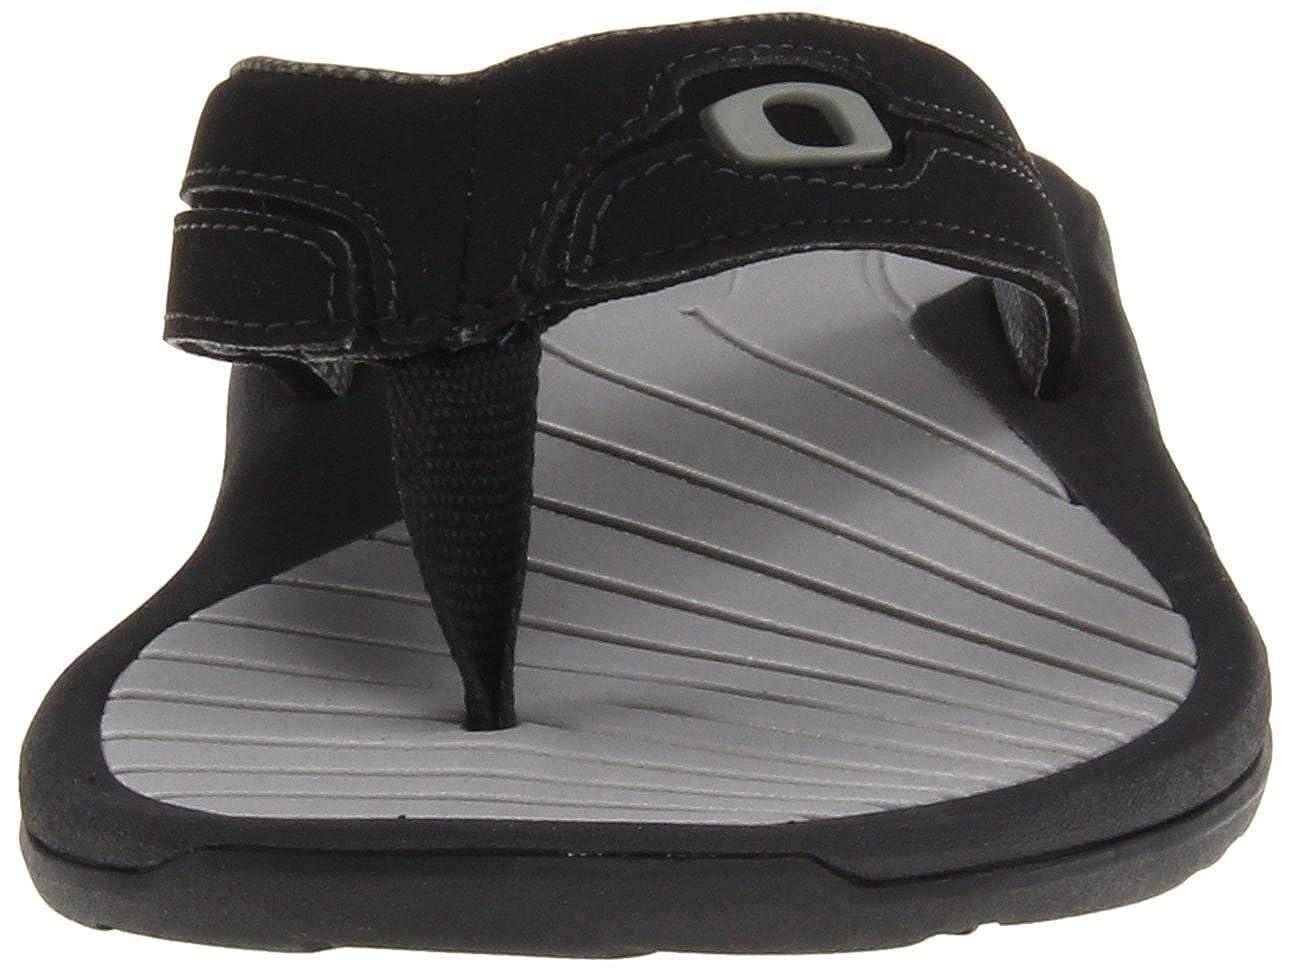 62d8802ba2203 Oakley Dune Sandals Black